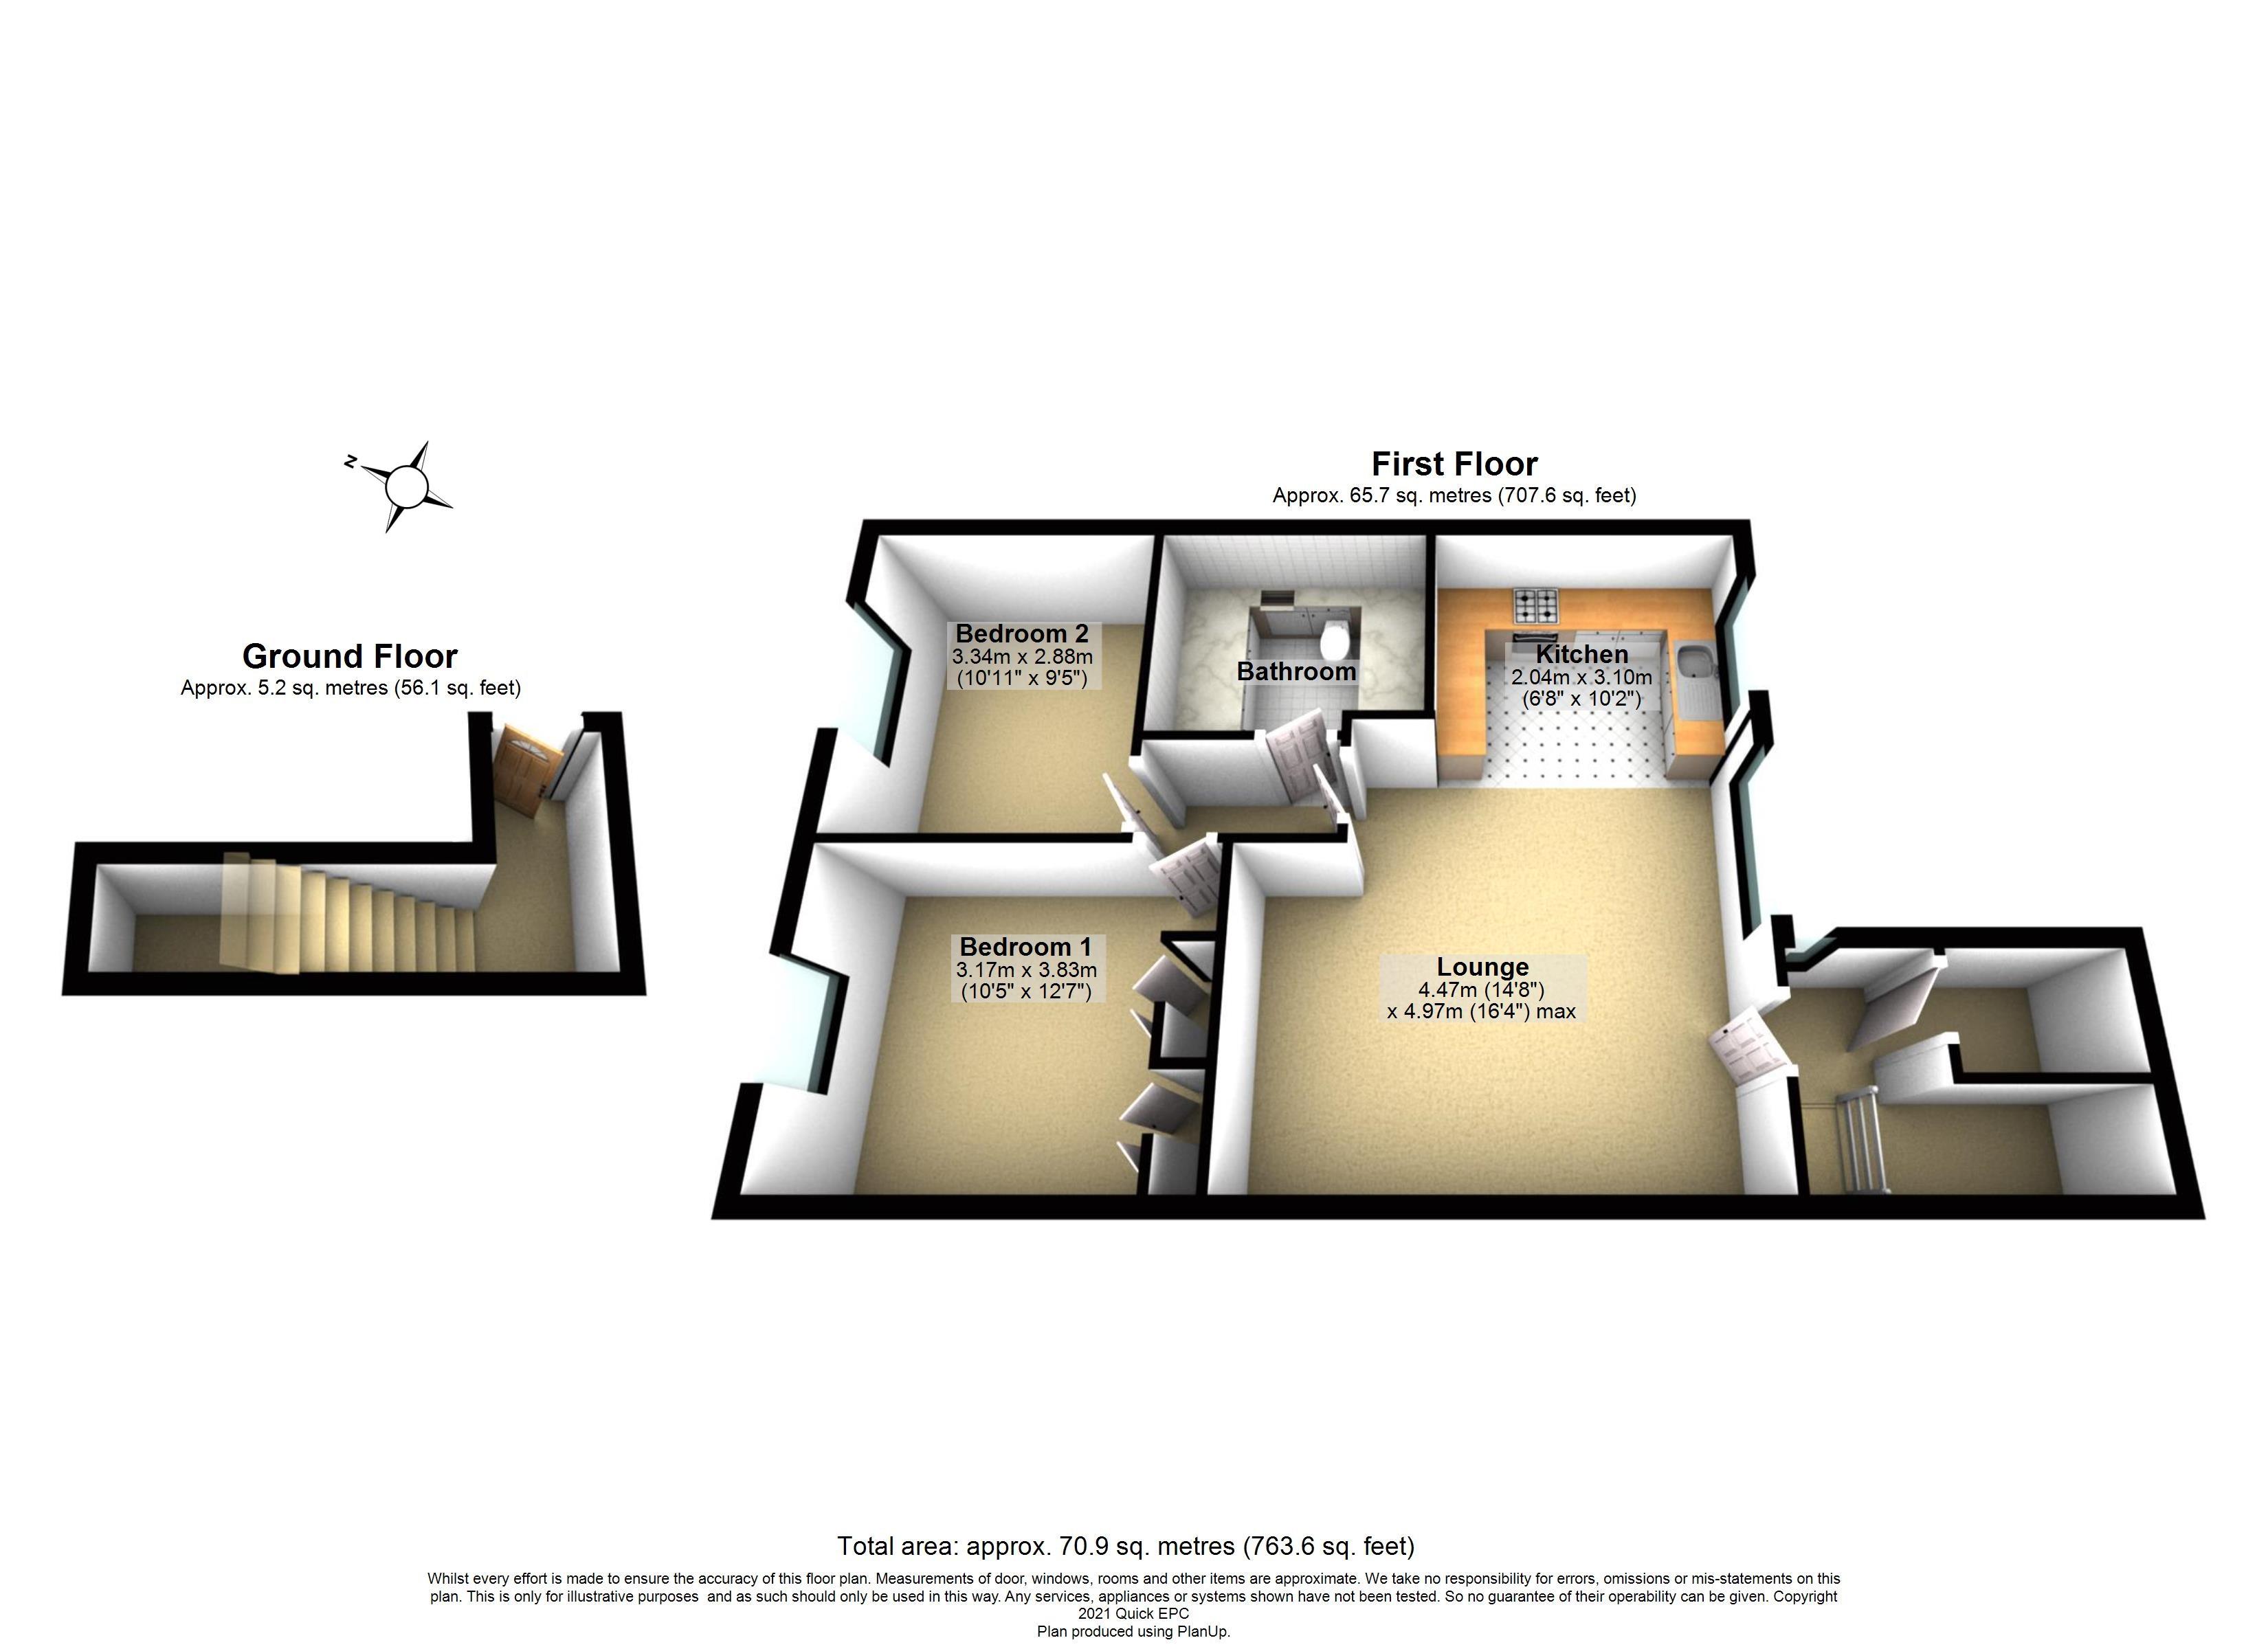 7 Ilford Court Floorplan